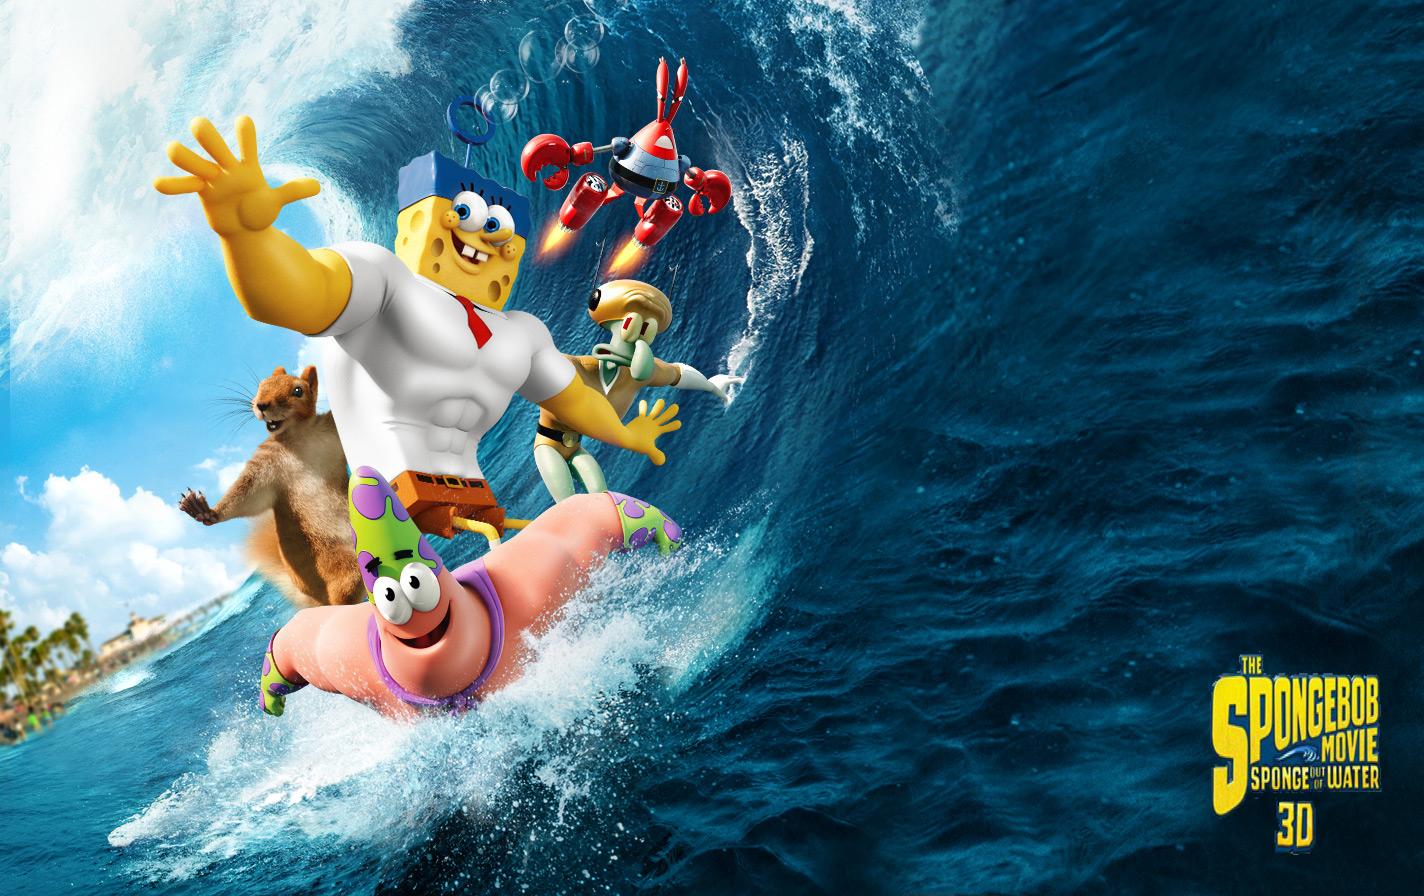 spongebob movie - wallpapers, gallery 555786838